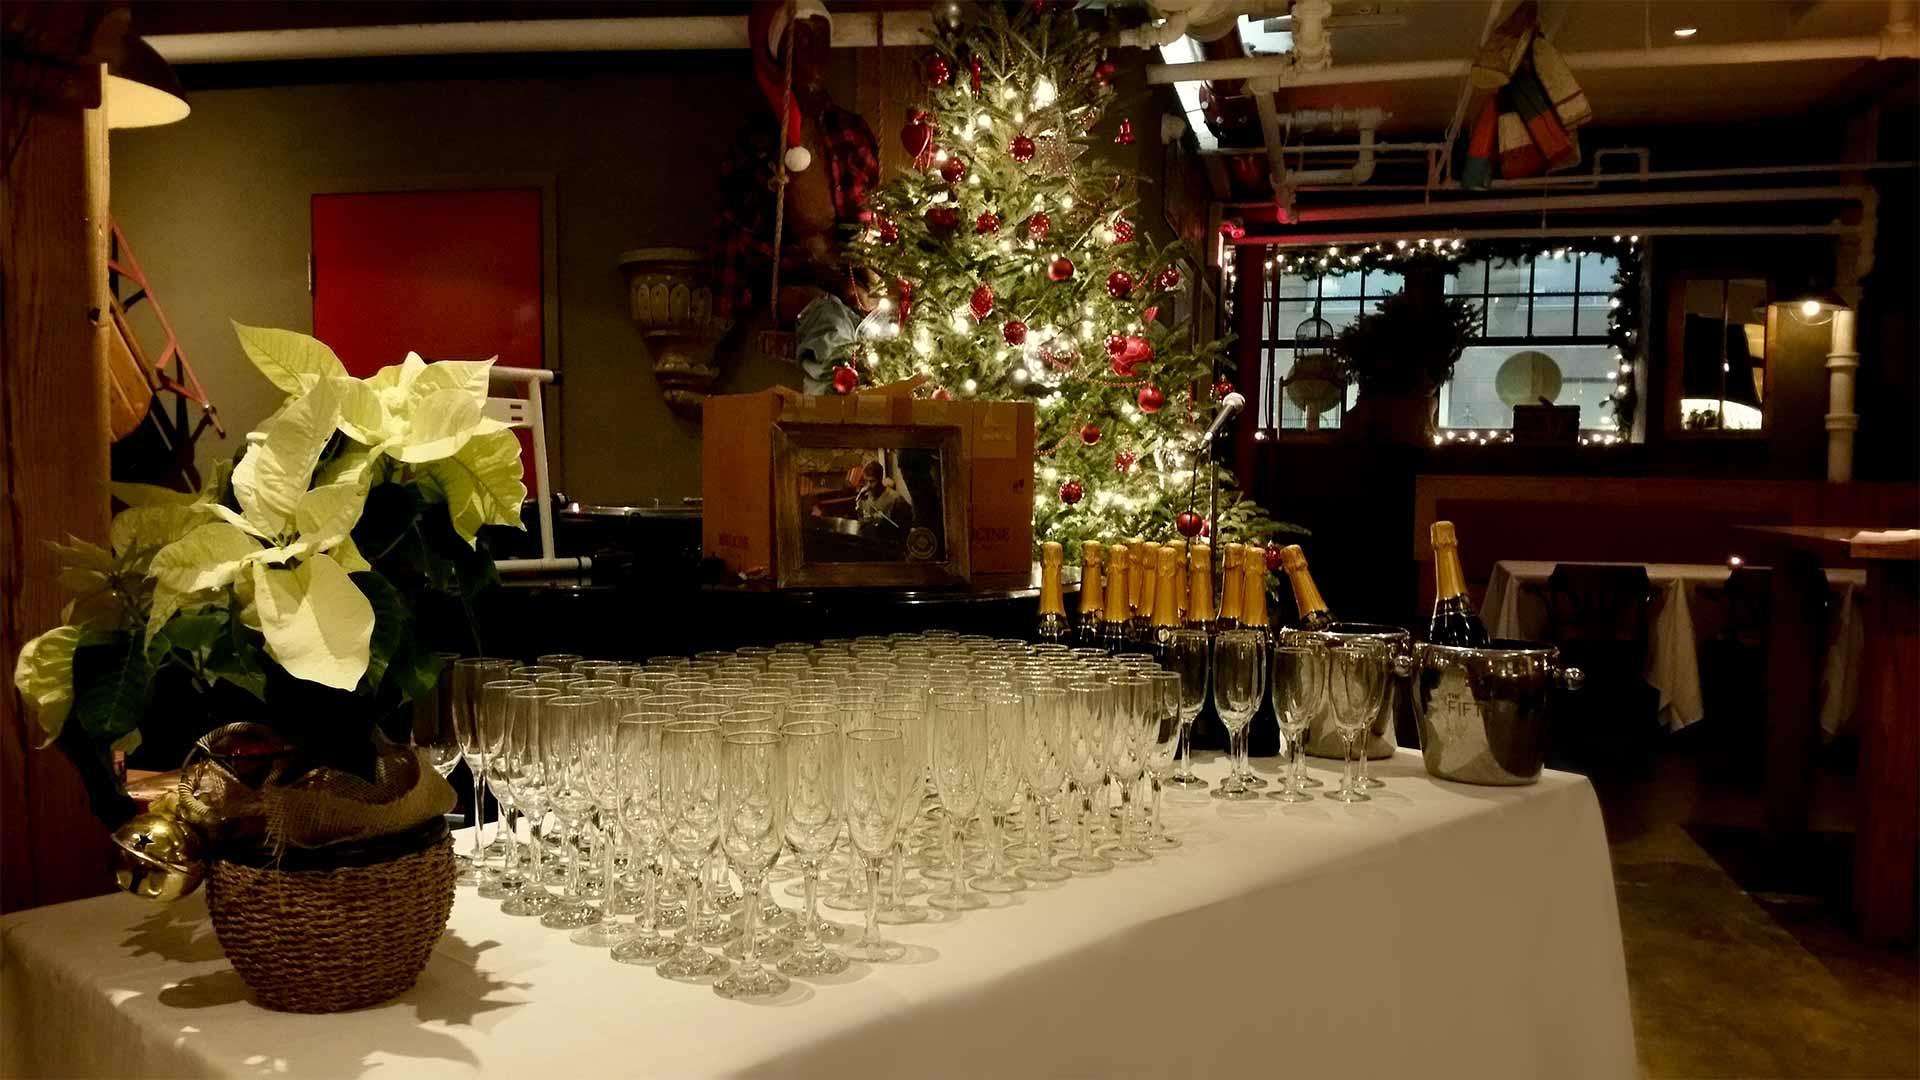 Toronto Wedding Venue - The Fifth Pubhouse - Reception Area